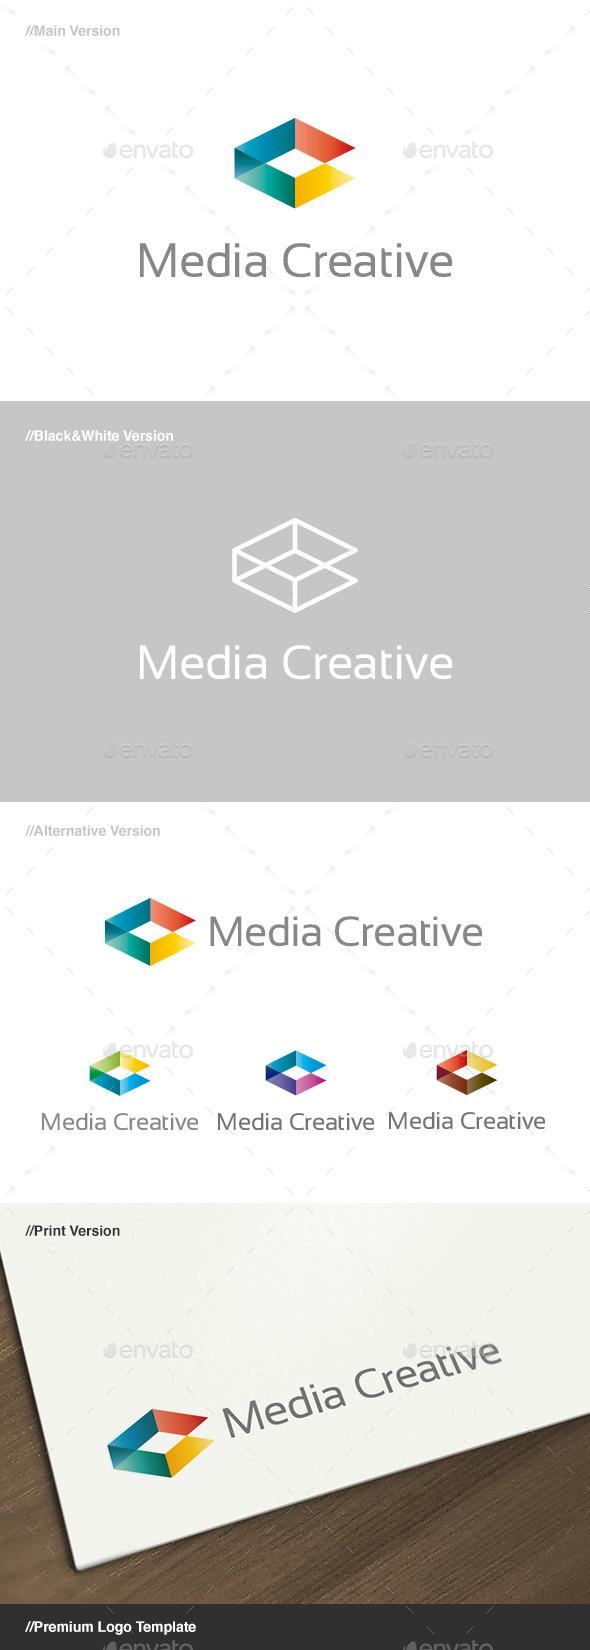 Media Creative Logo